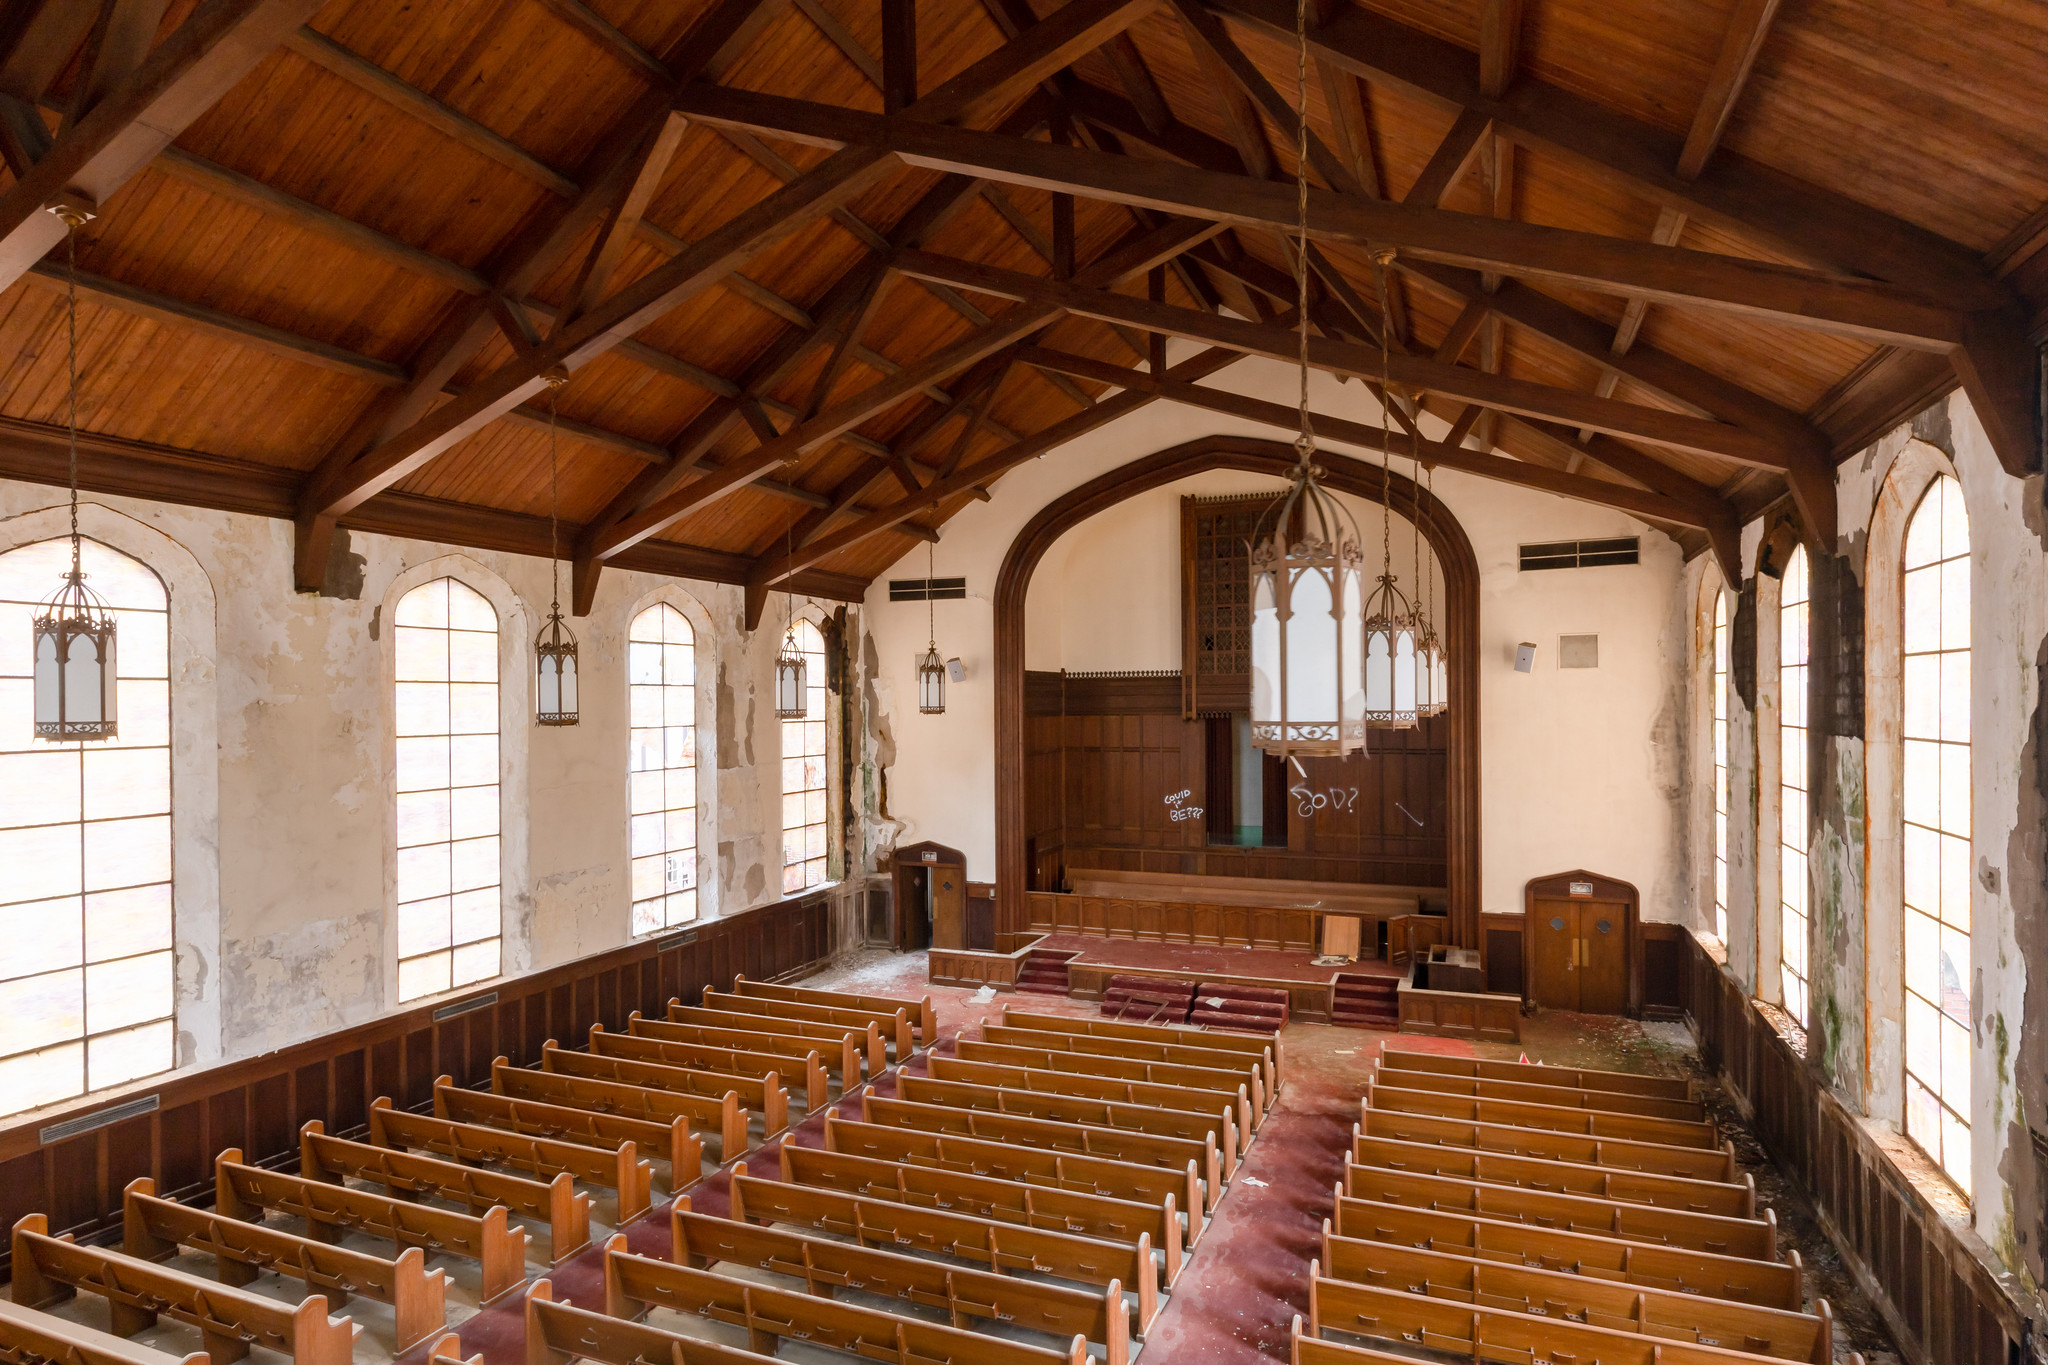 Jackson Hill Baptist